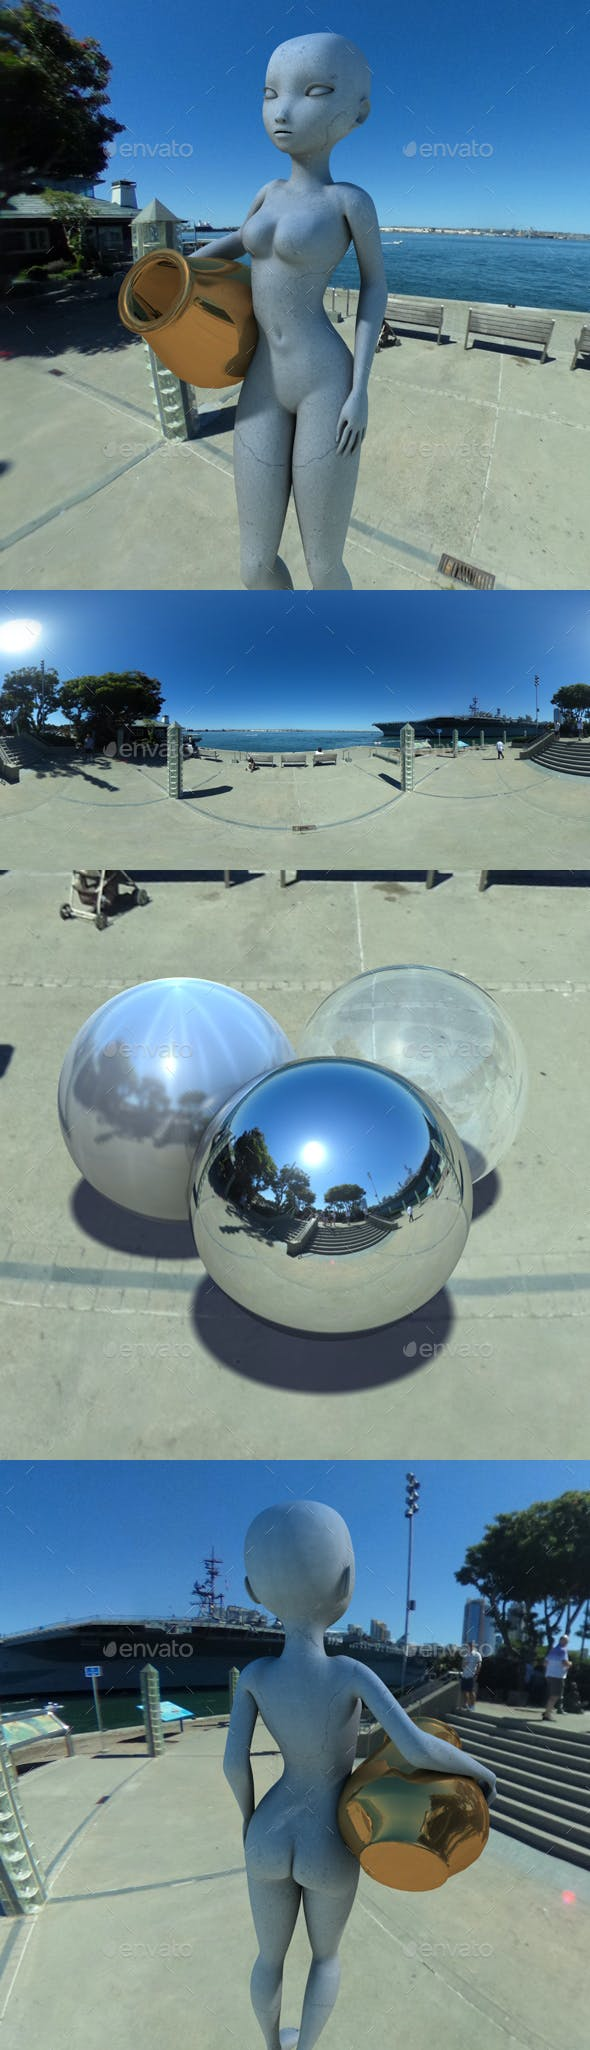 Clear Blue Sky Pier HDRI - 3DOcean Item for Sale